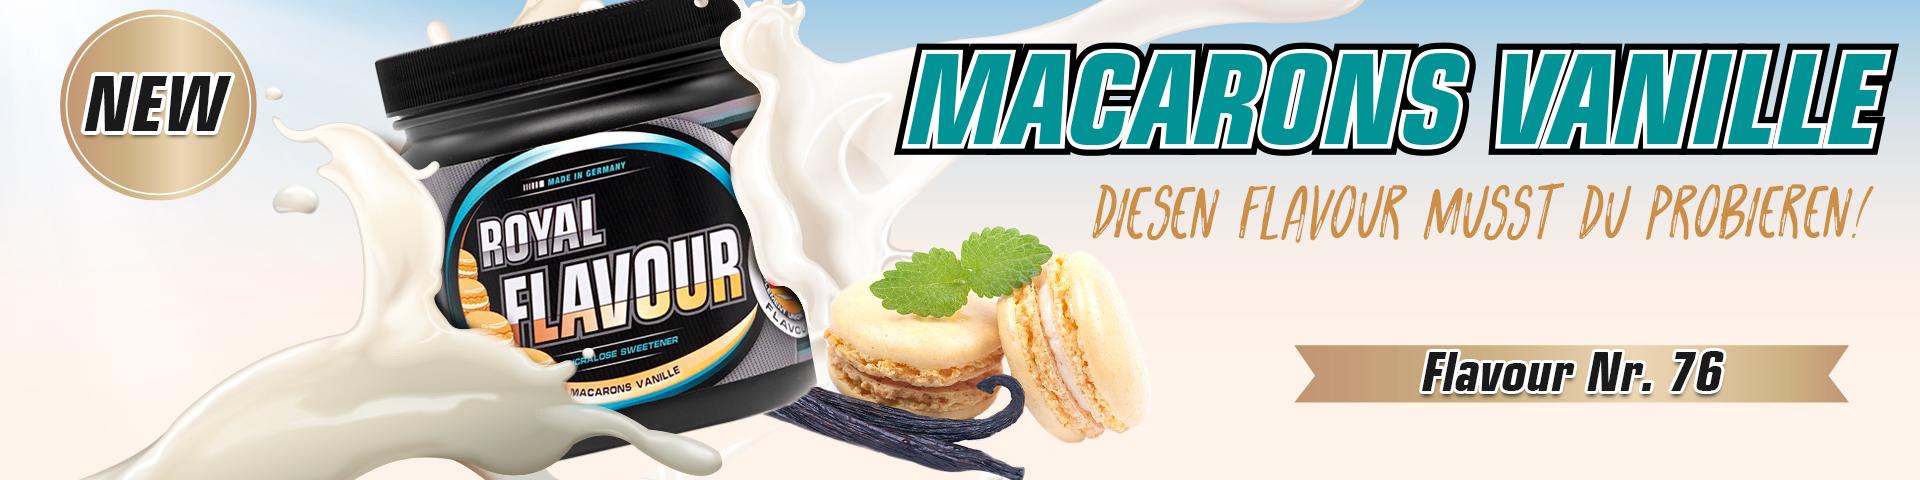 royalflavour-macarons-vanille.jpg